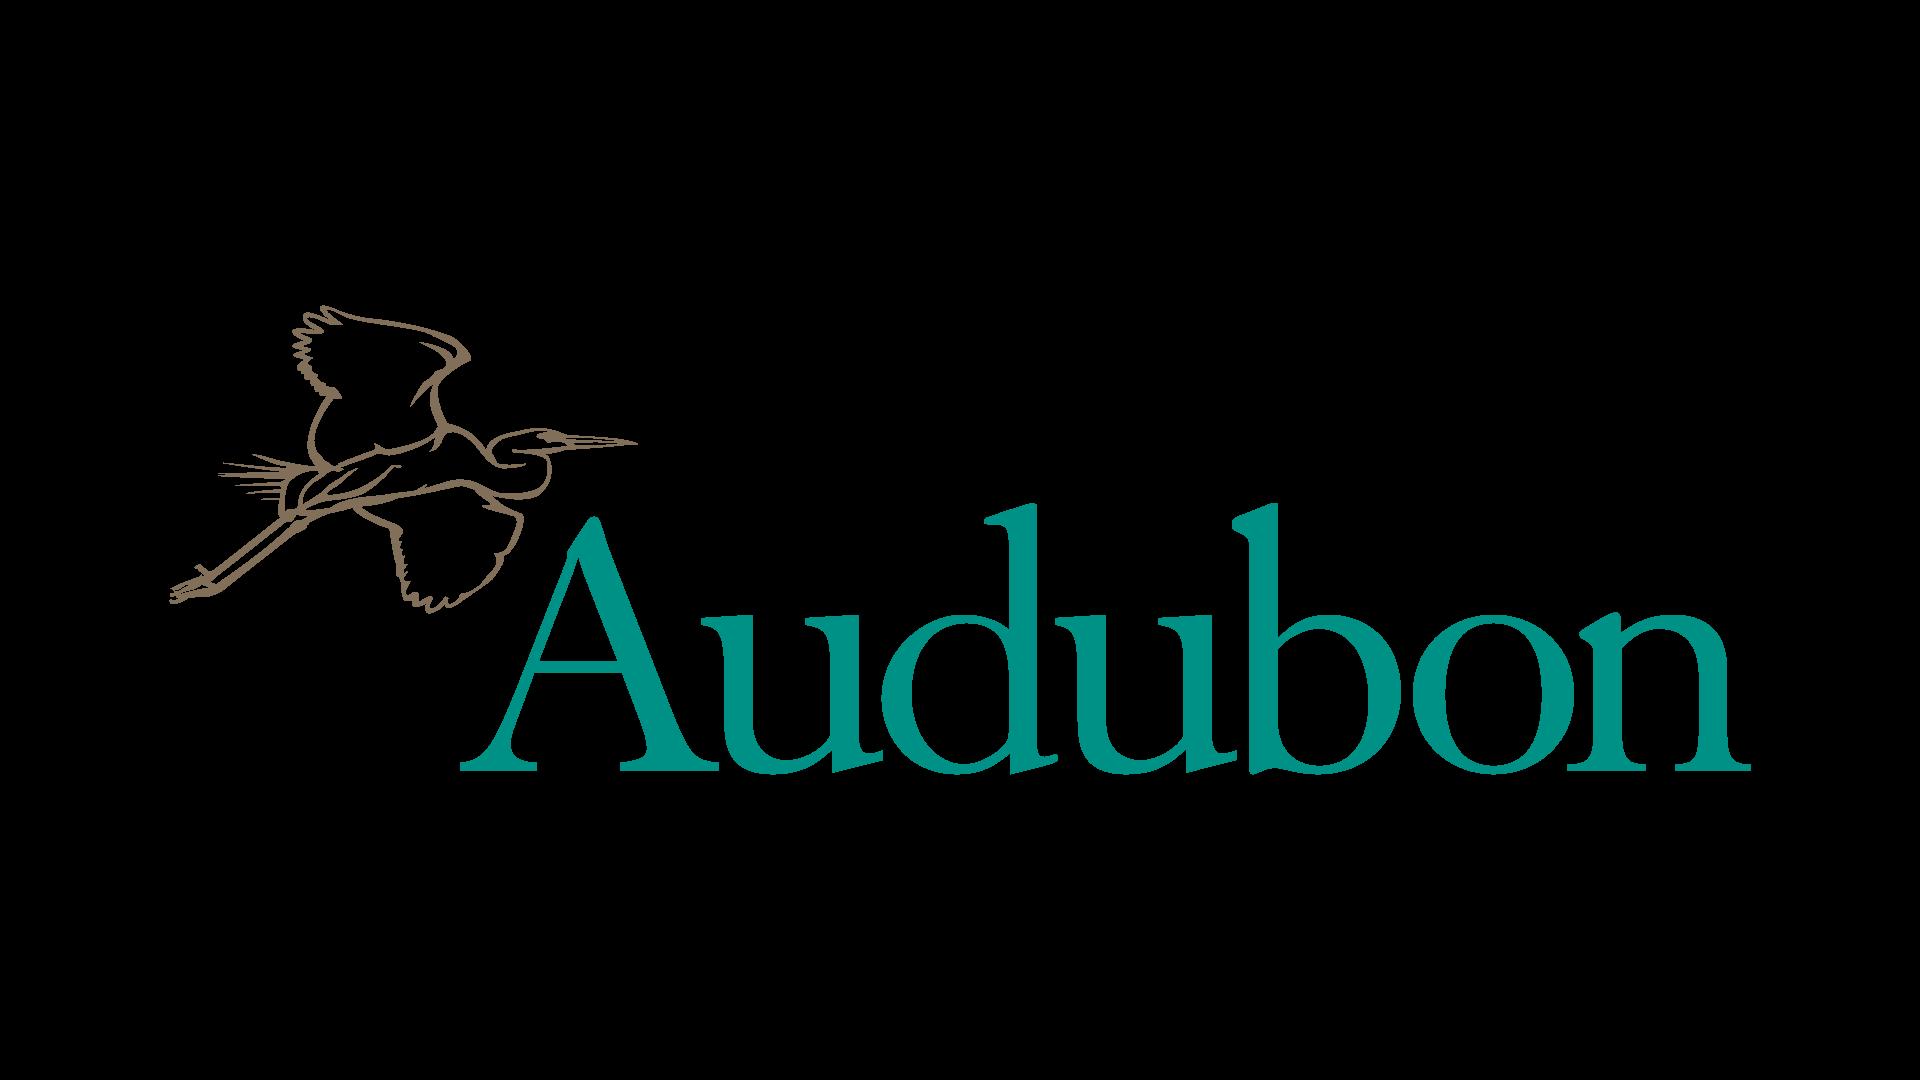 Audubon_1920.png